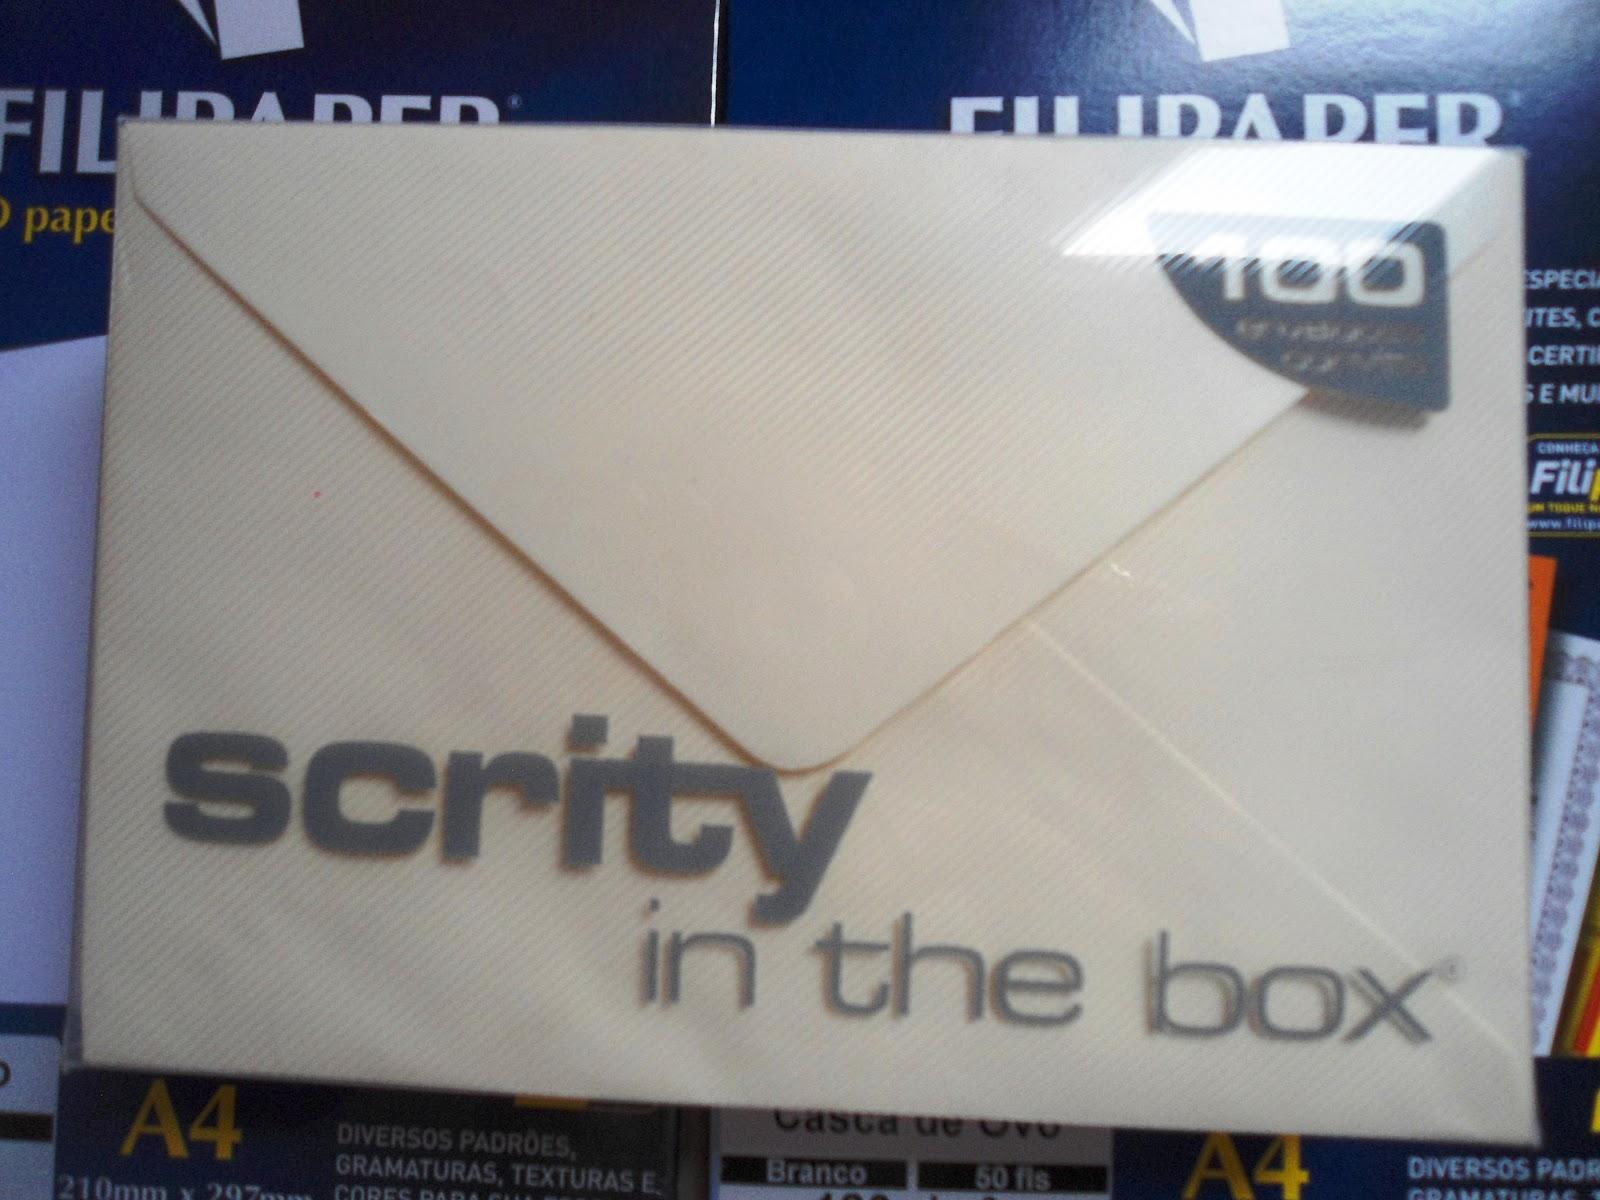 Imagens de #6B4830 Scrity in te box Marfim Tamanho Grande 1600x1200 px 2776 Box Banheiro Nh